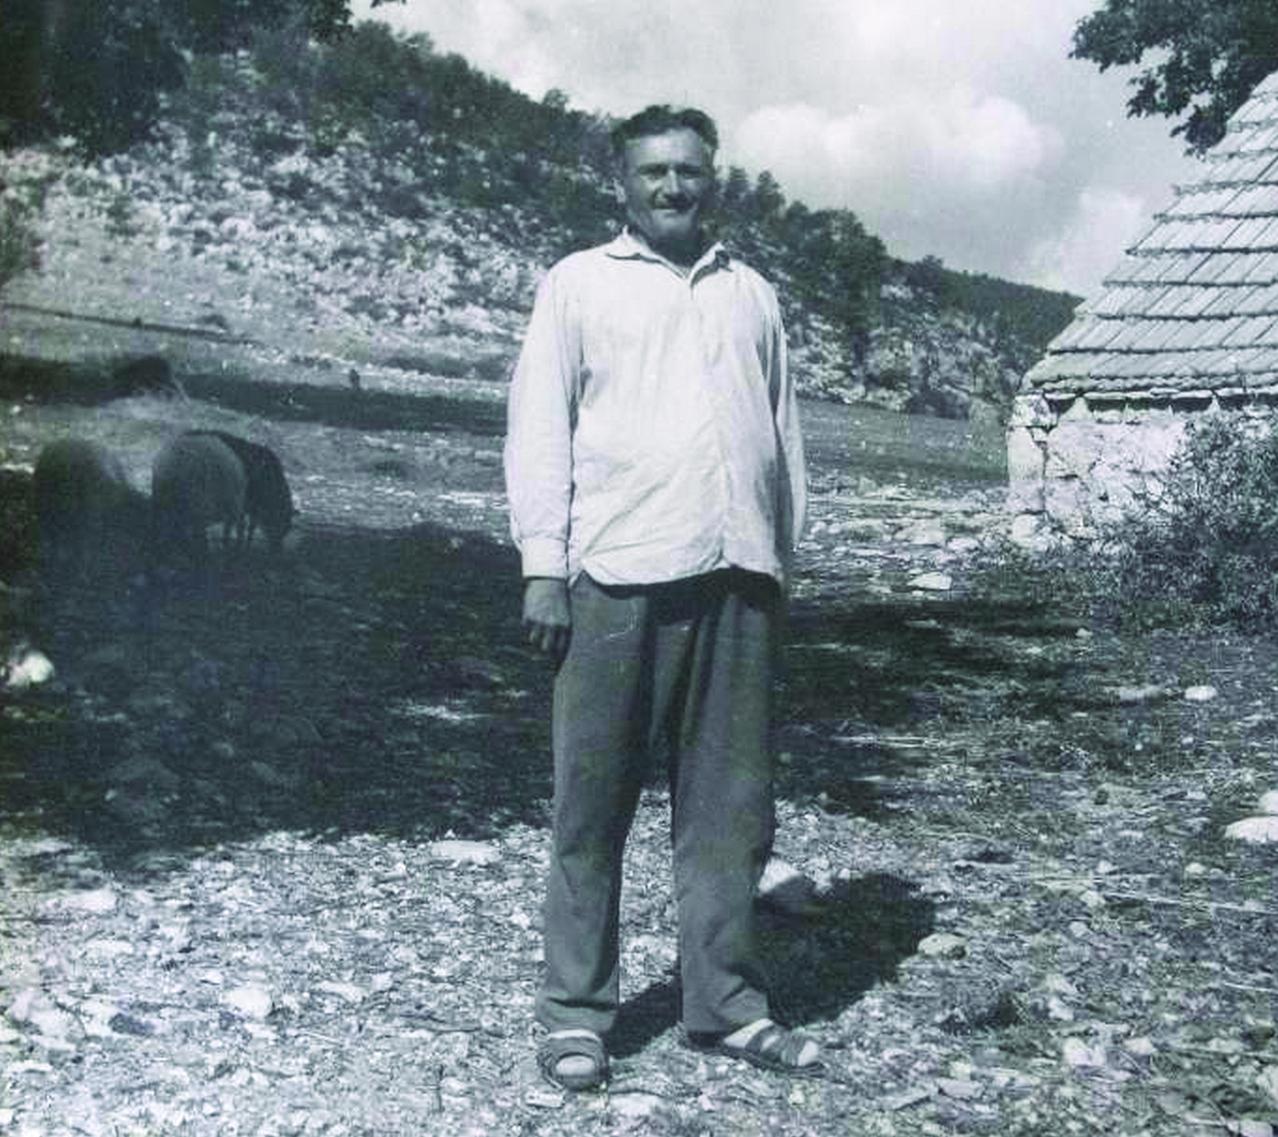 Košute - Kukuzovac, 24.IX.1943.